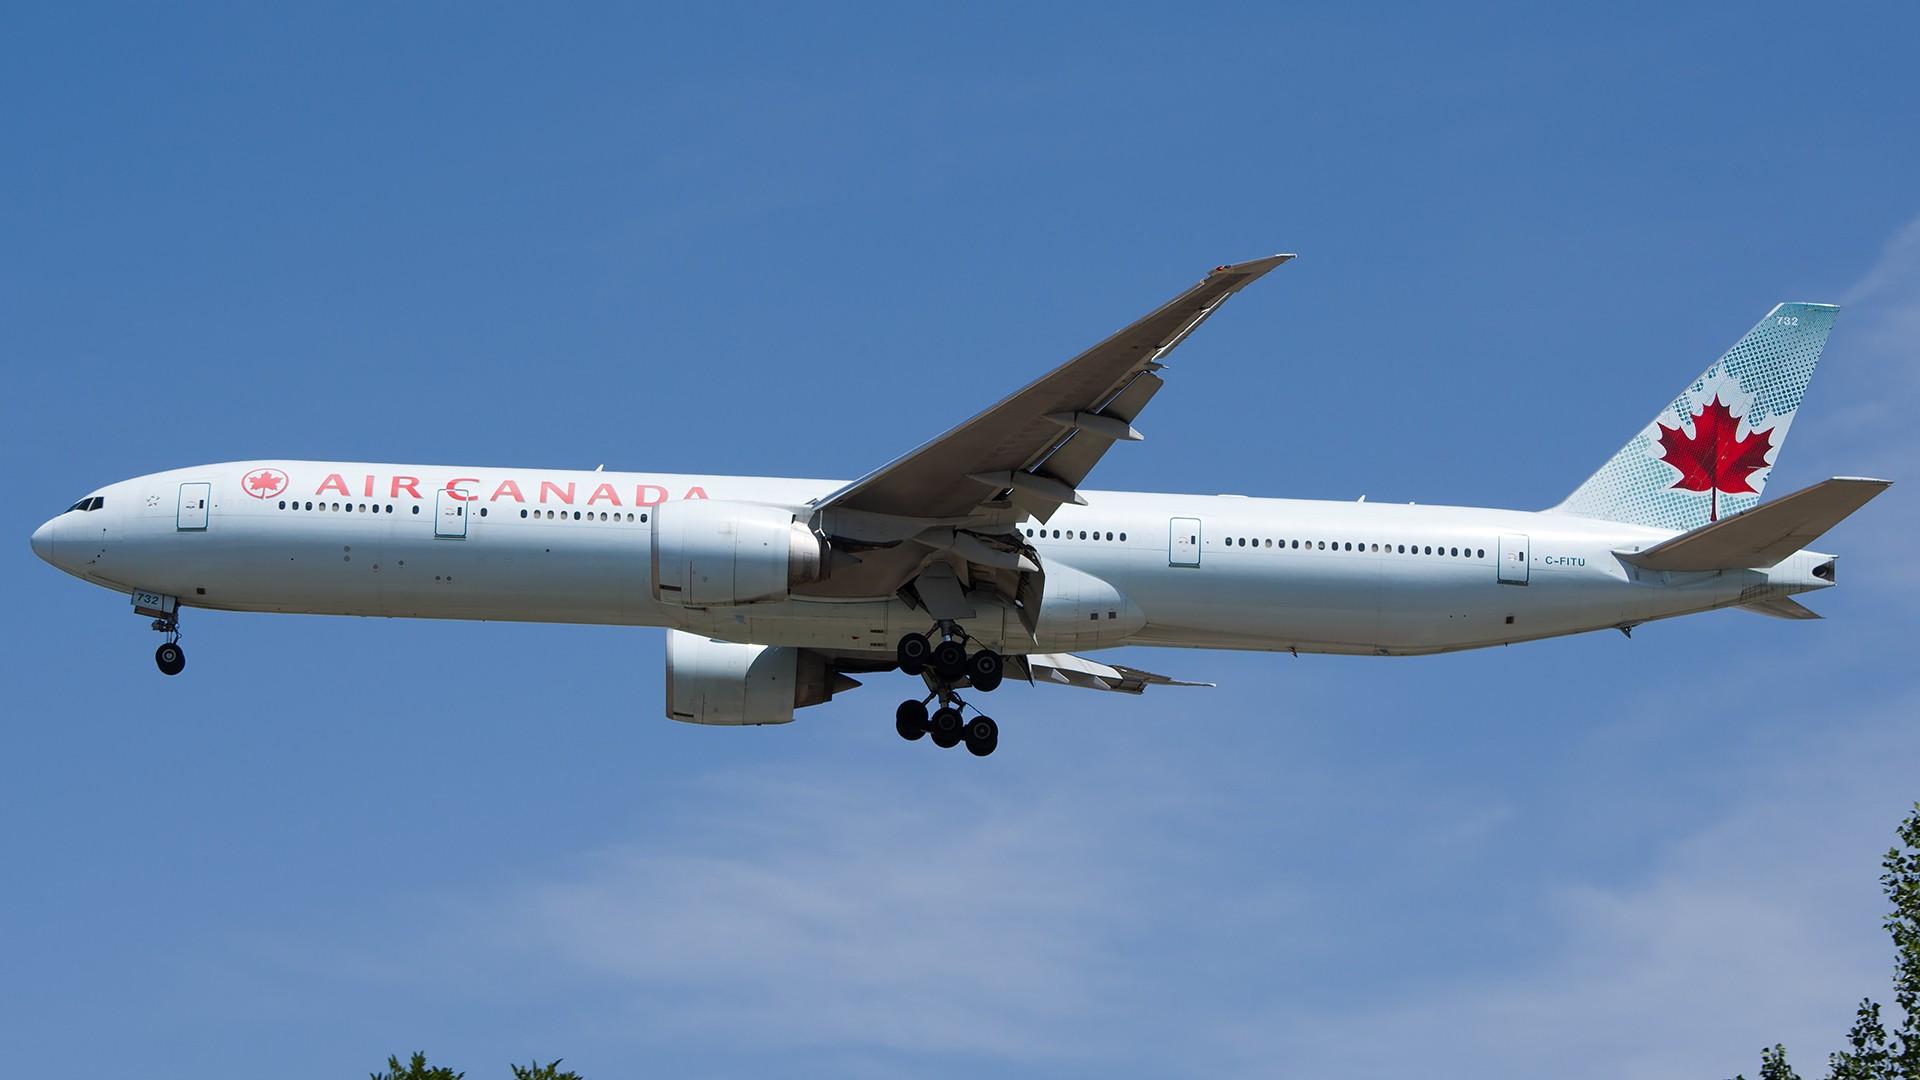 Re:[原创]PEK01午后两小时抓拍,其实是为AA的One World来的 BOEING 777-300ER C-FITU 中国北京首都国际机场